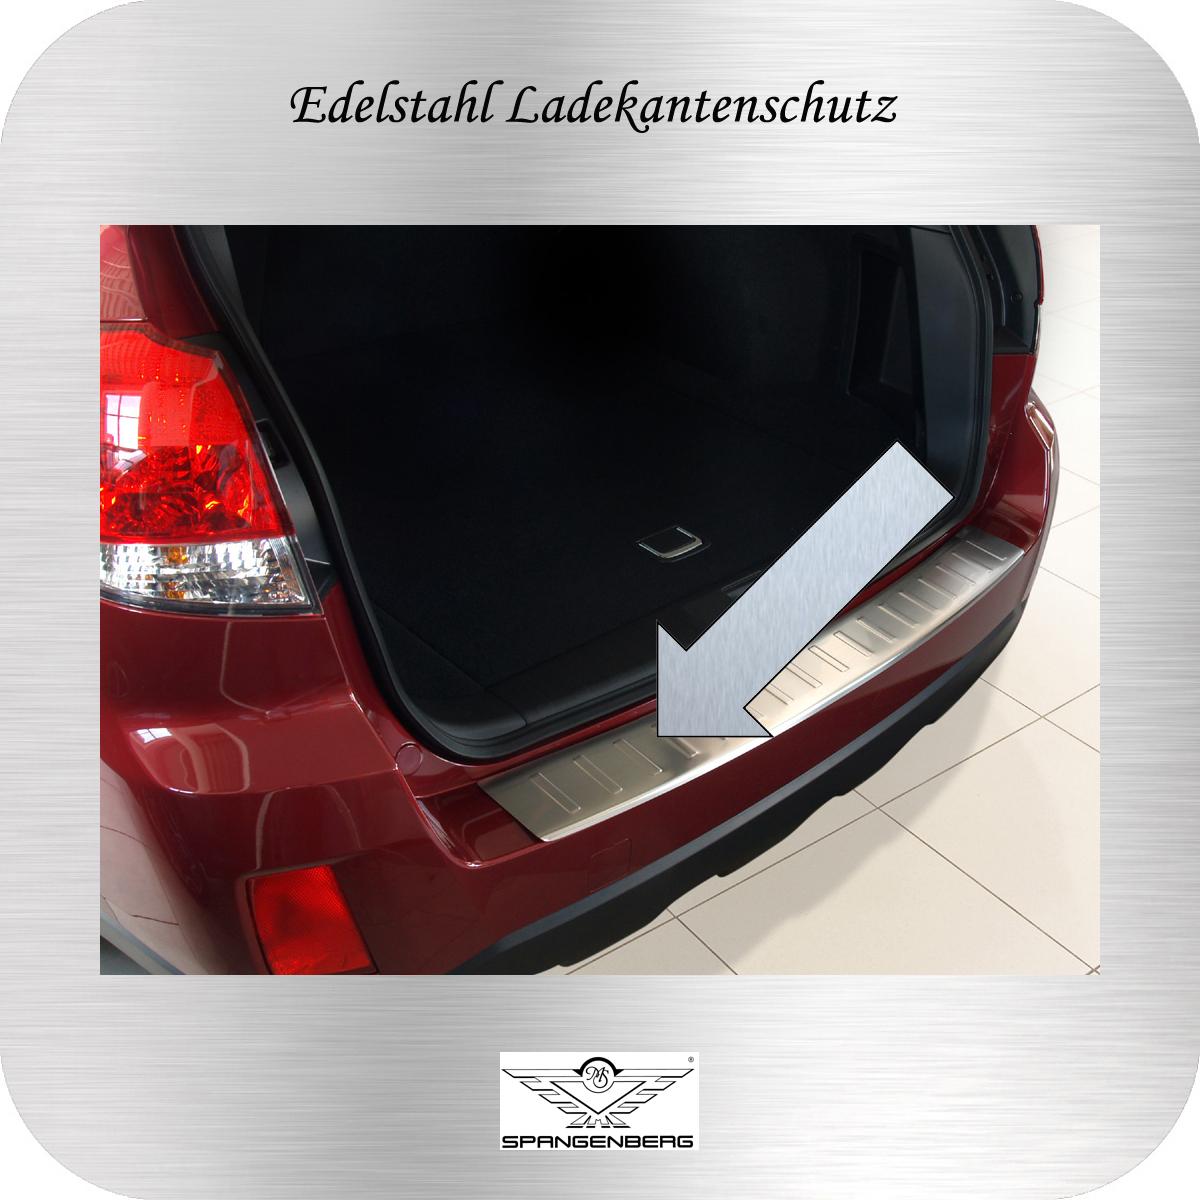 Ladekantenschutz Edelstahl Subaru Outback IV Typ BR Kombi 2009-2015 3235037